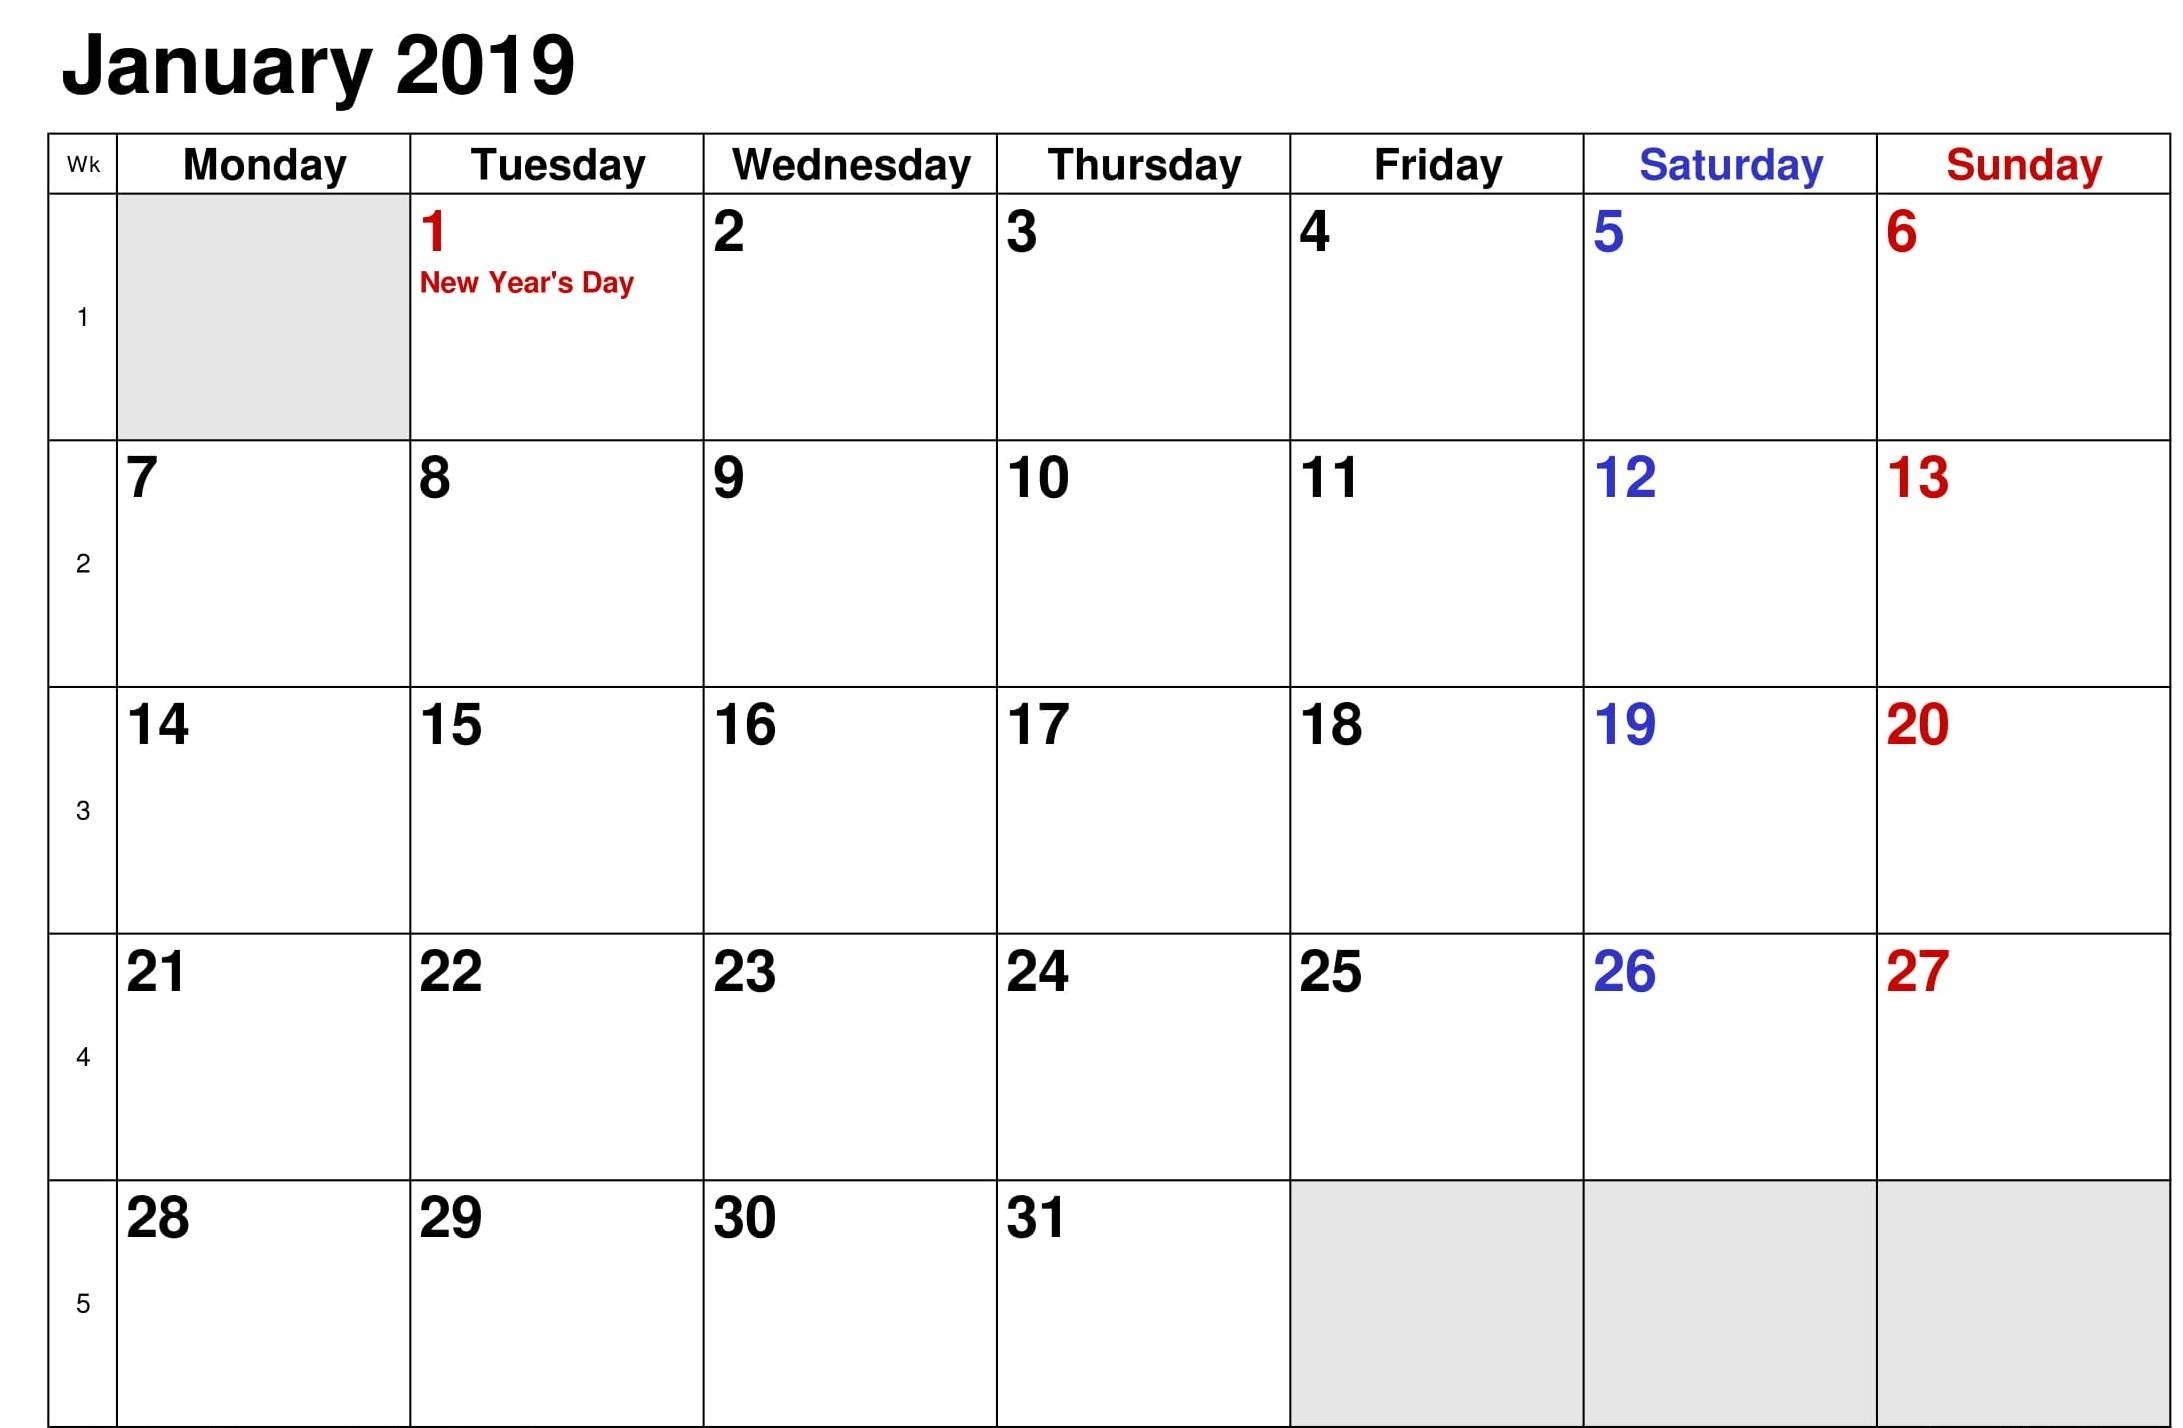 January Calendar 2019 Canada – Task Management Template Worksheet Calendar Of 2019 Canada